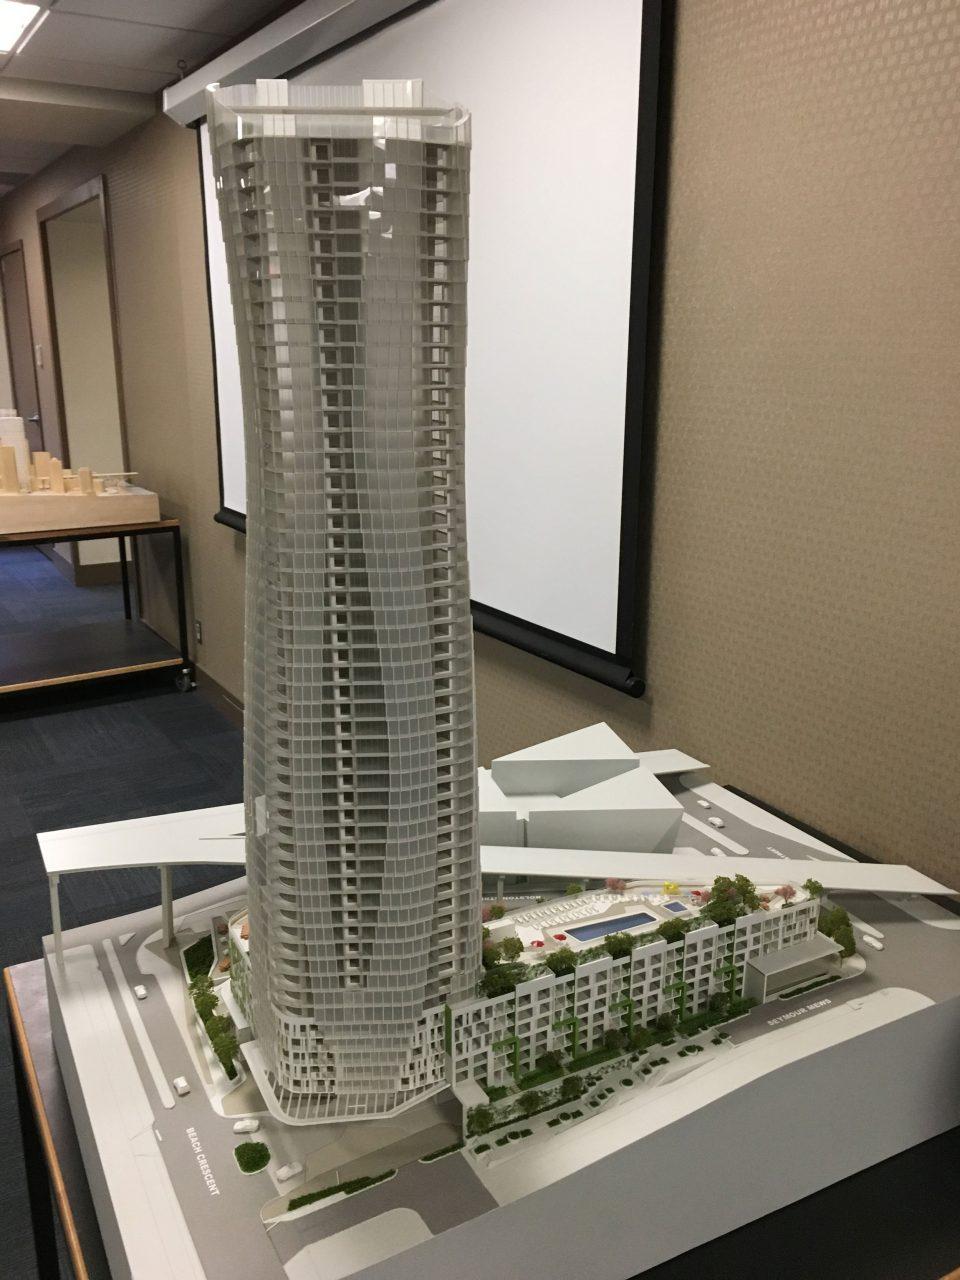 Tower model